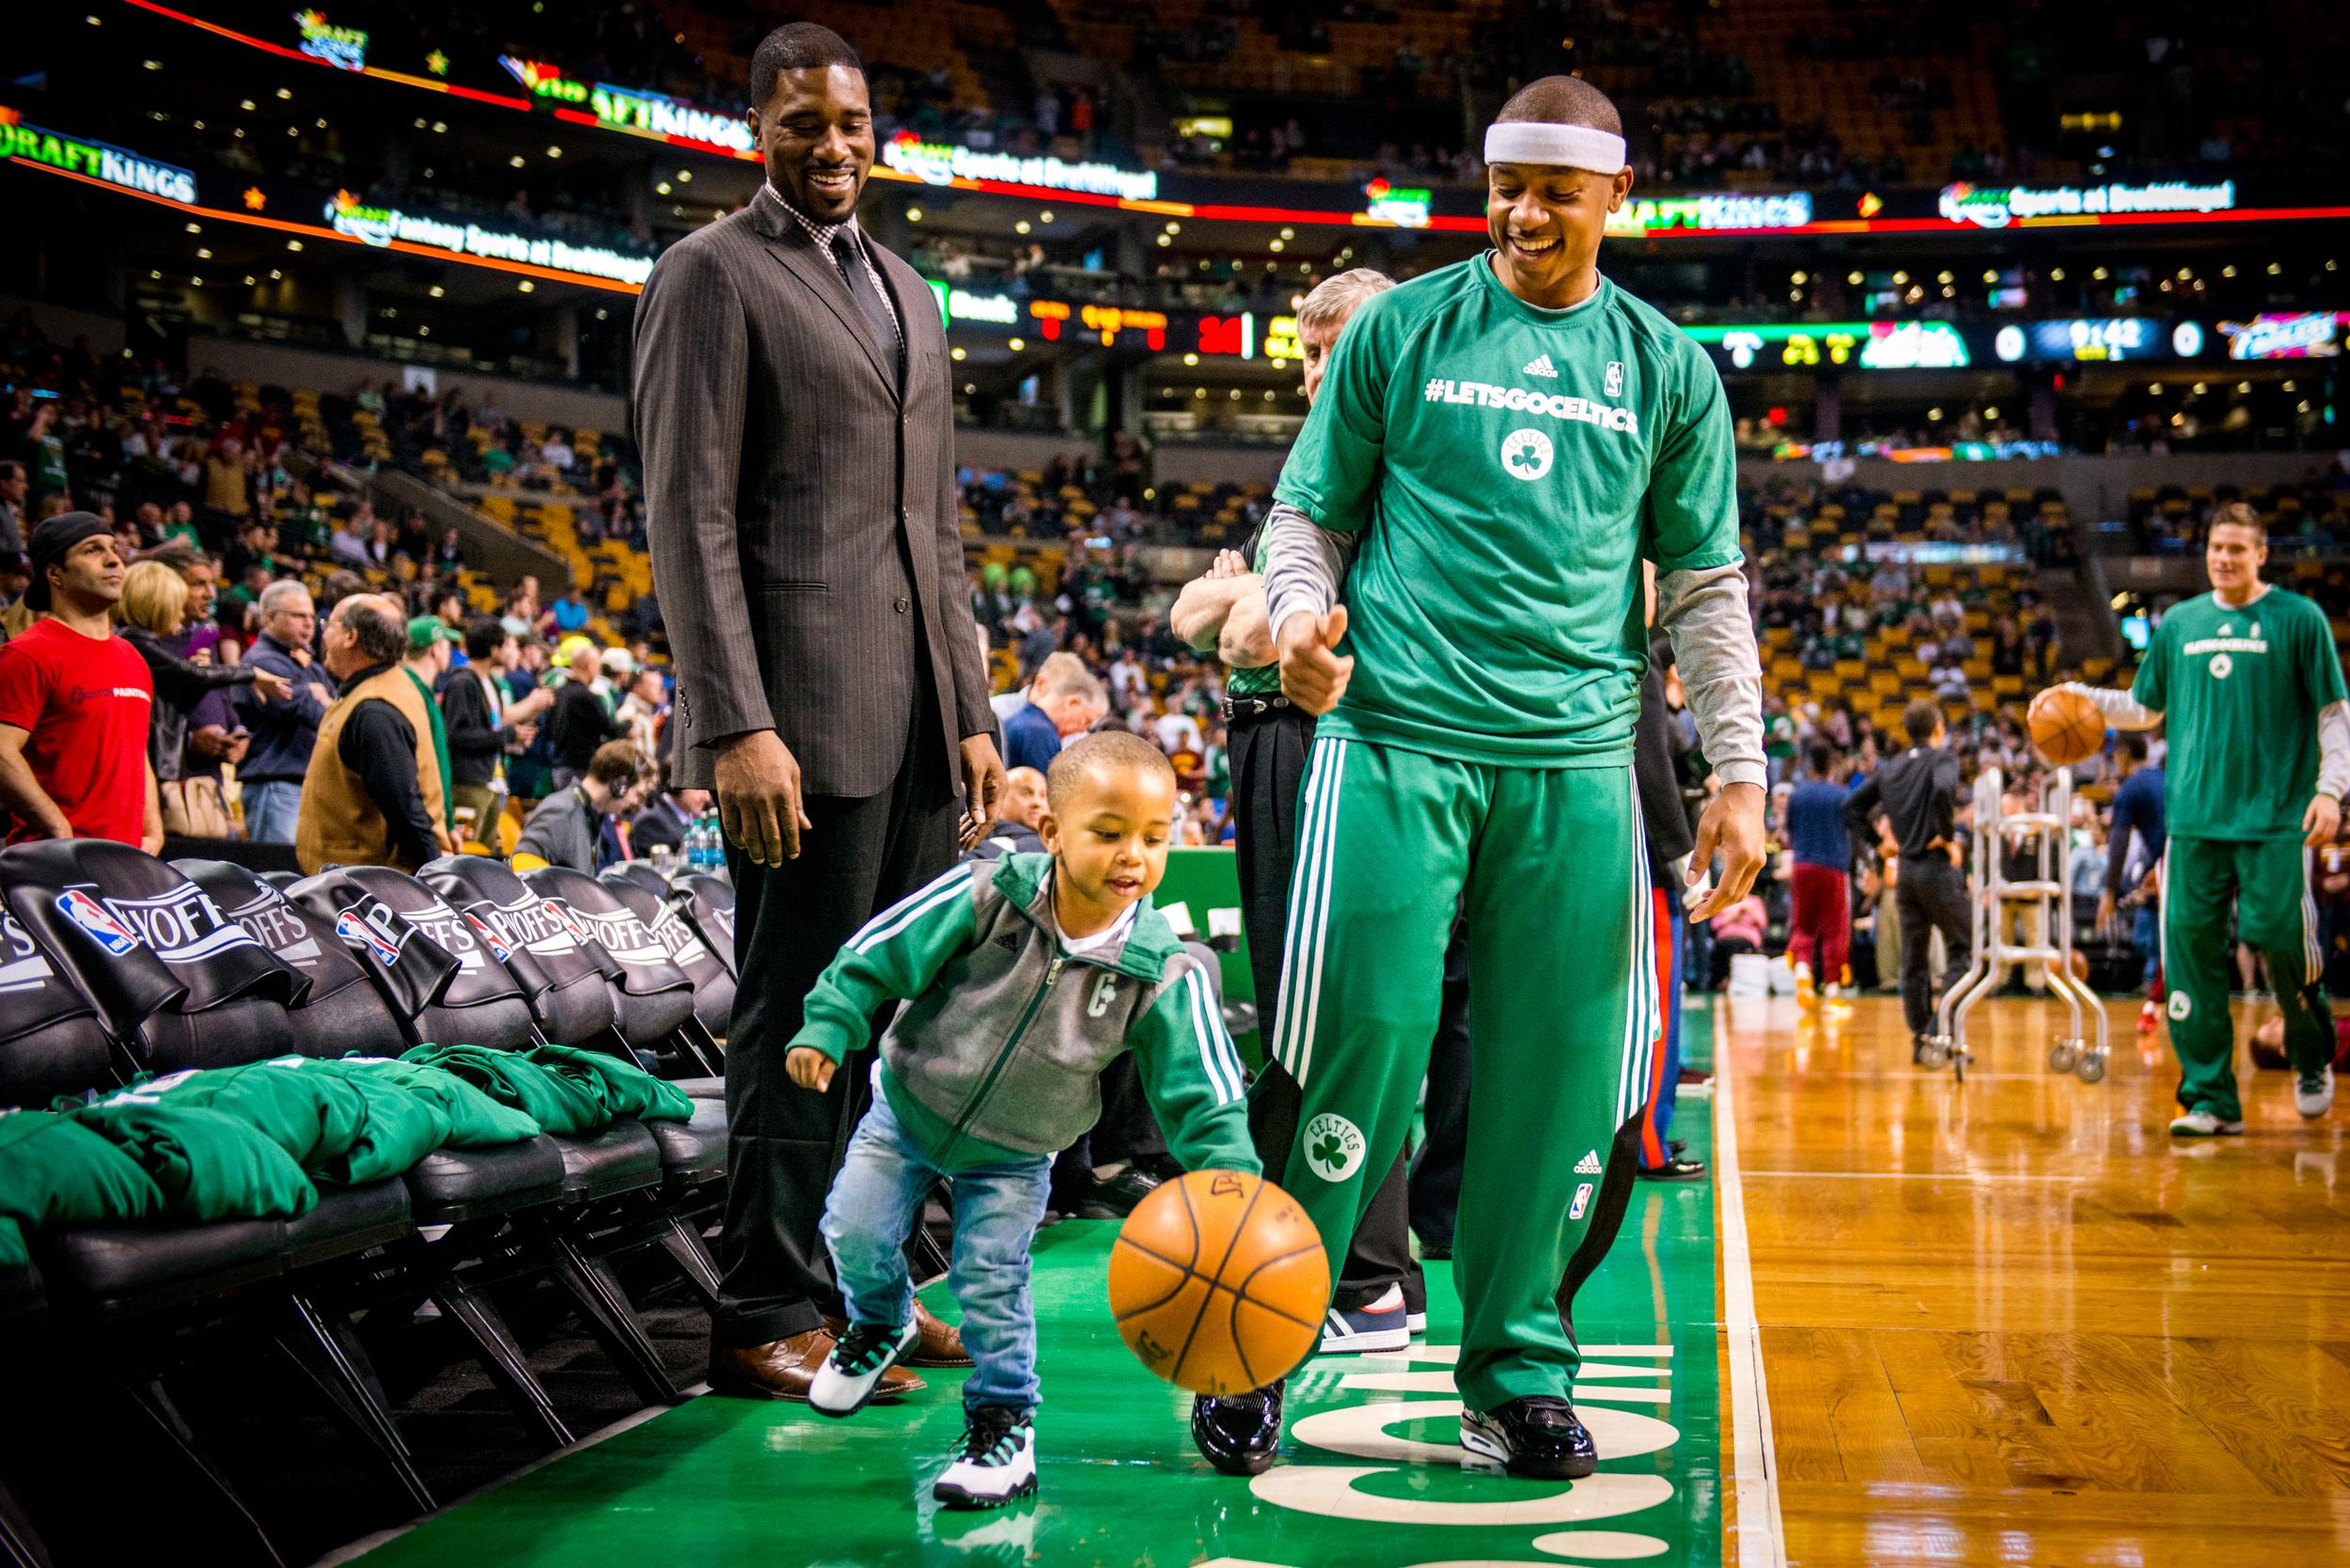 Celtics vs. Cavs   Game 4 Playoffs   Isaiah Thomas and his son alongside Leon Powe